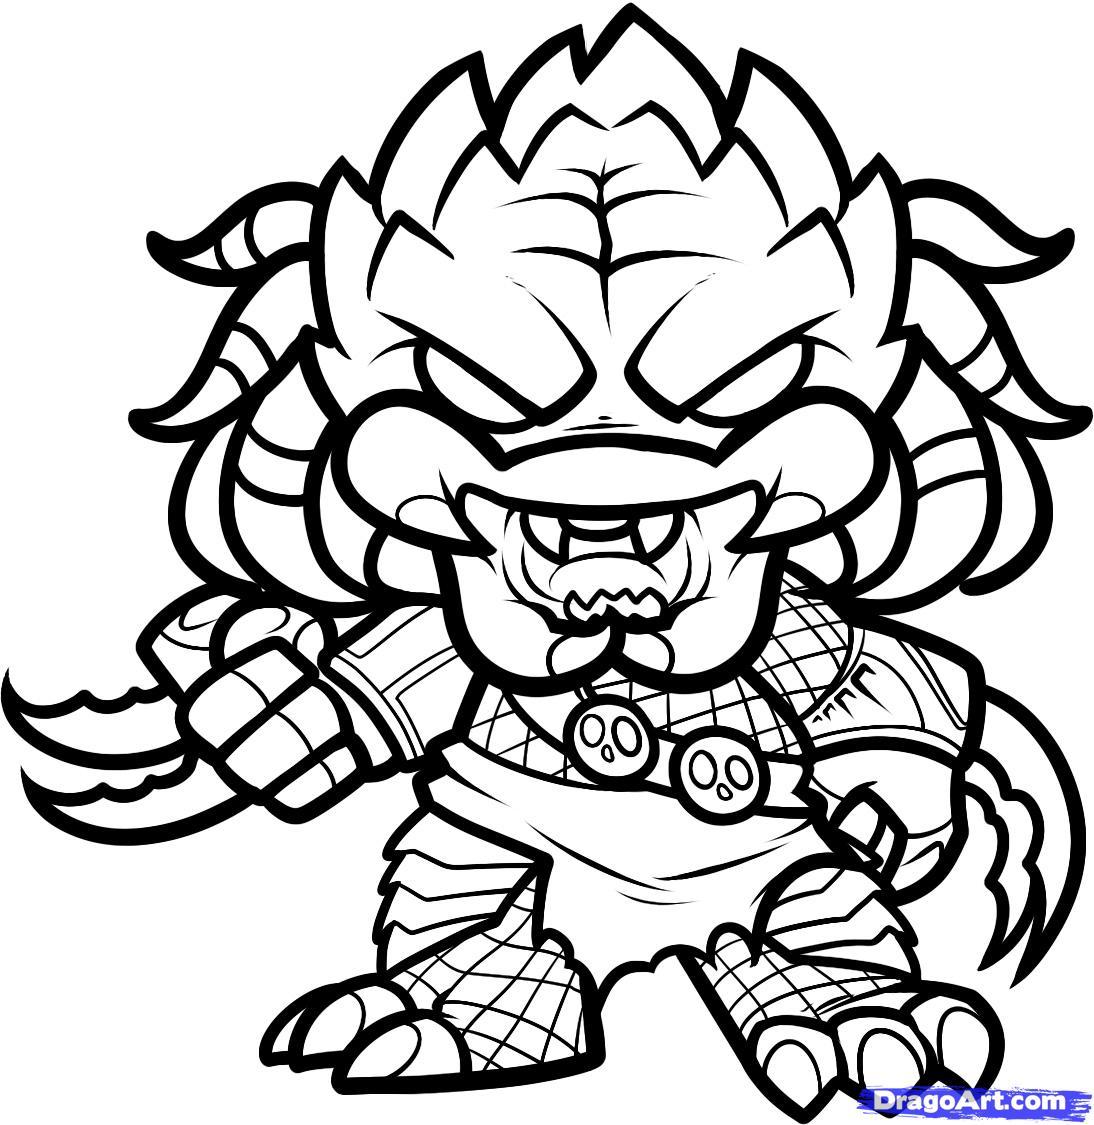 Drawn predator cartoon Predator Predator Chibi Draw to